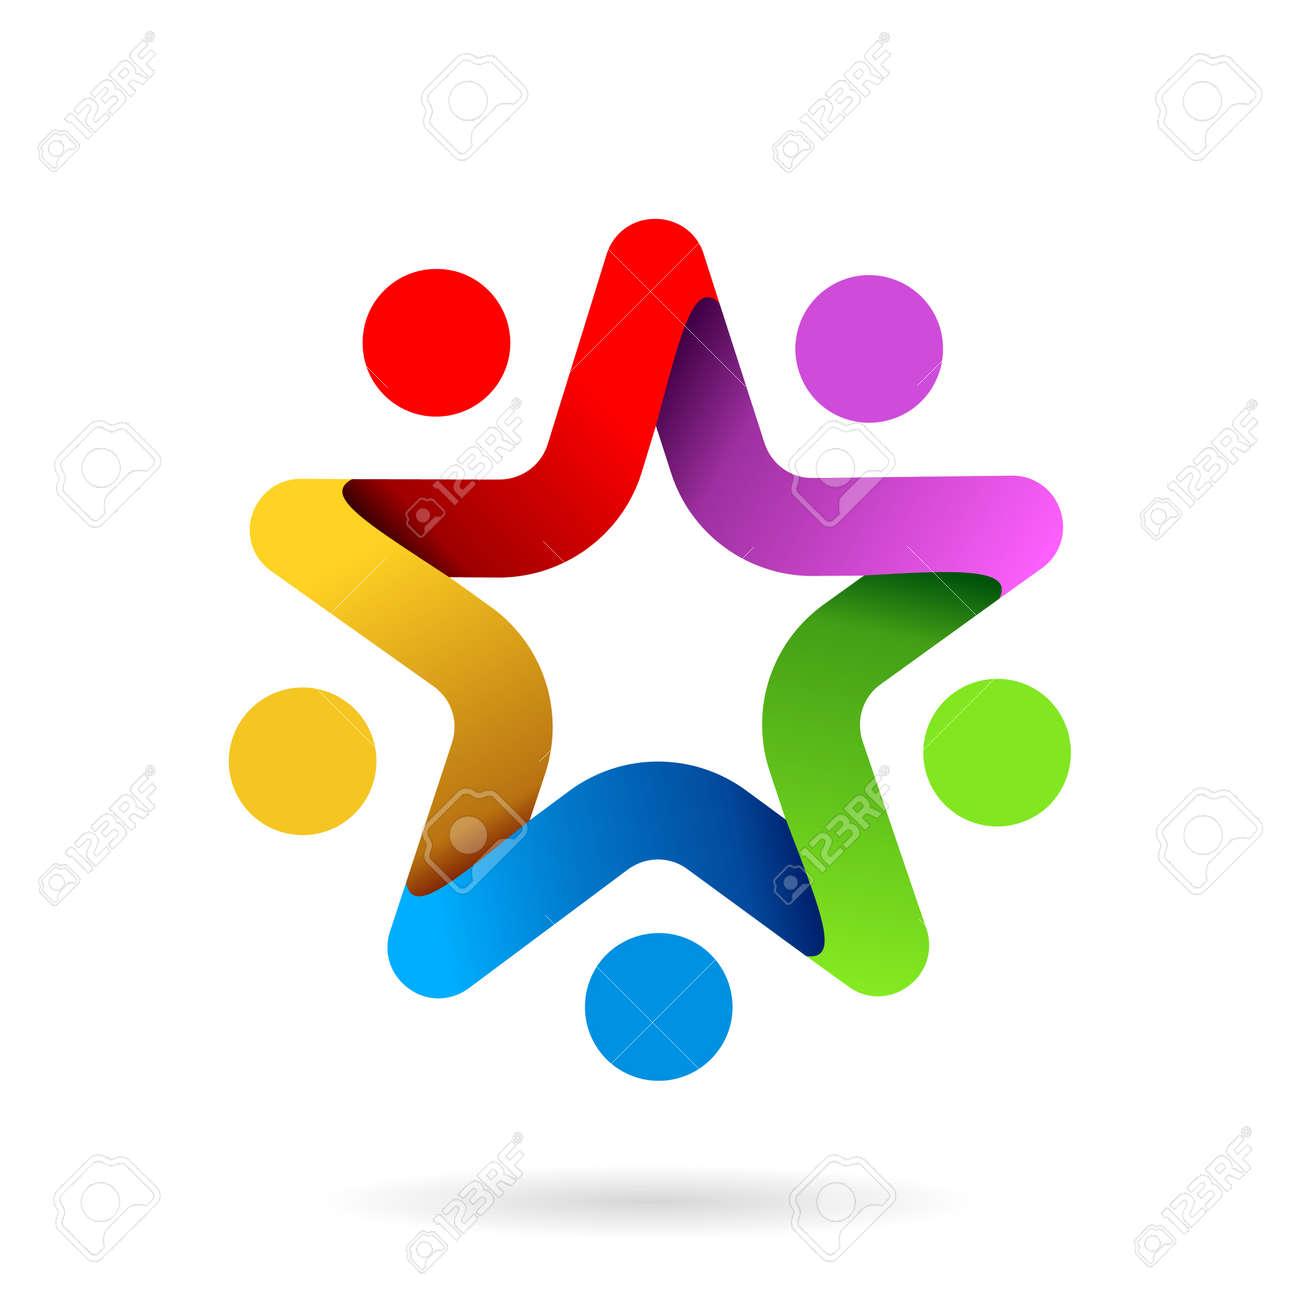 star team work symbol, star team work logo - 168309965